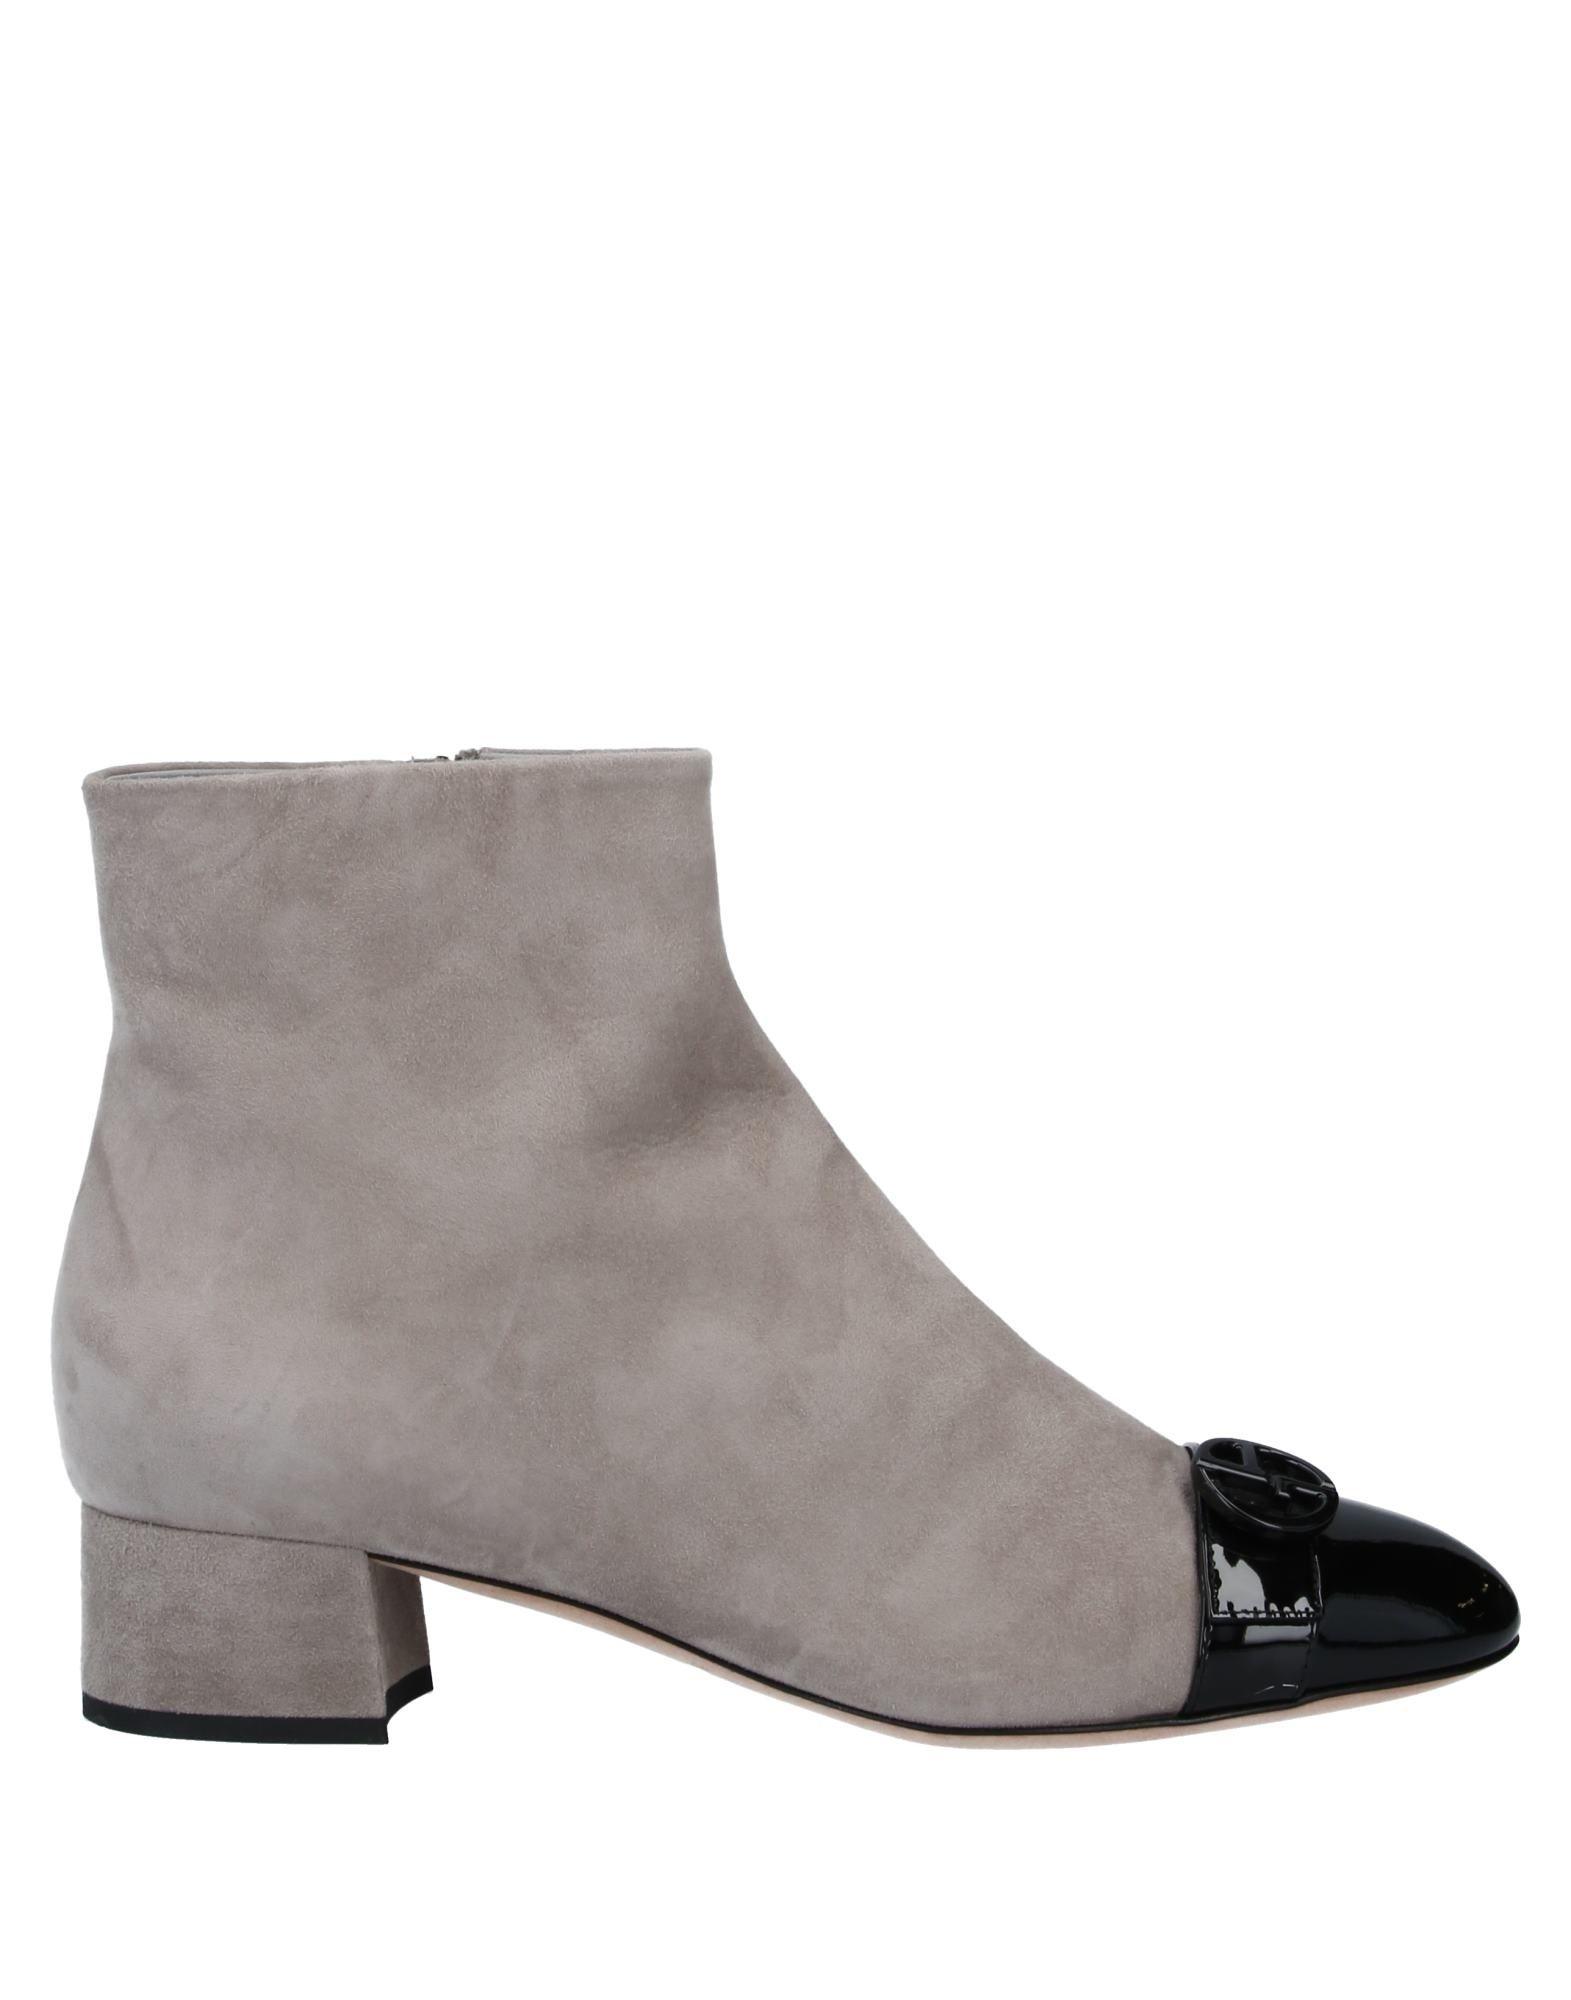 GIORGIO ARMANI Полусапоги и высокие ботинки armani exchange полусапоги и высокие ботинки